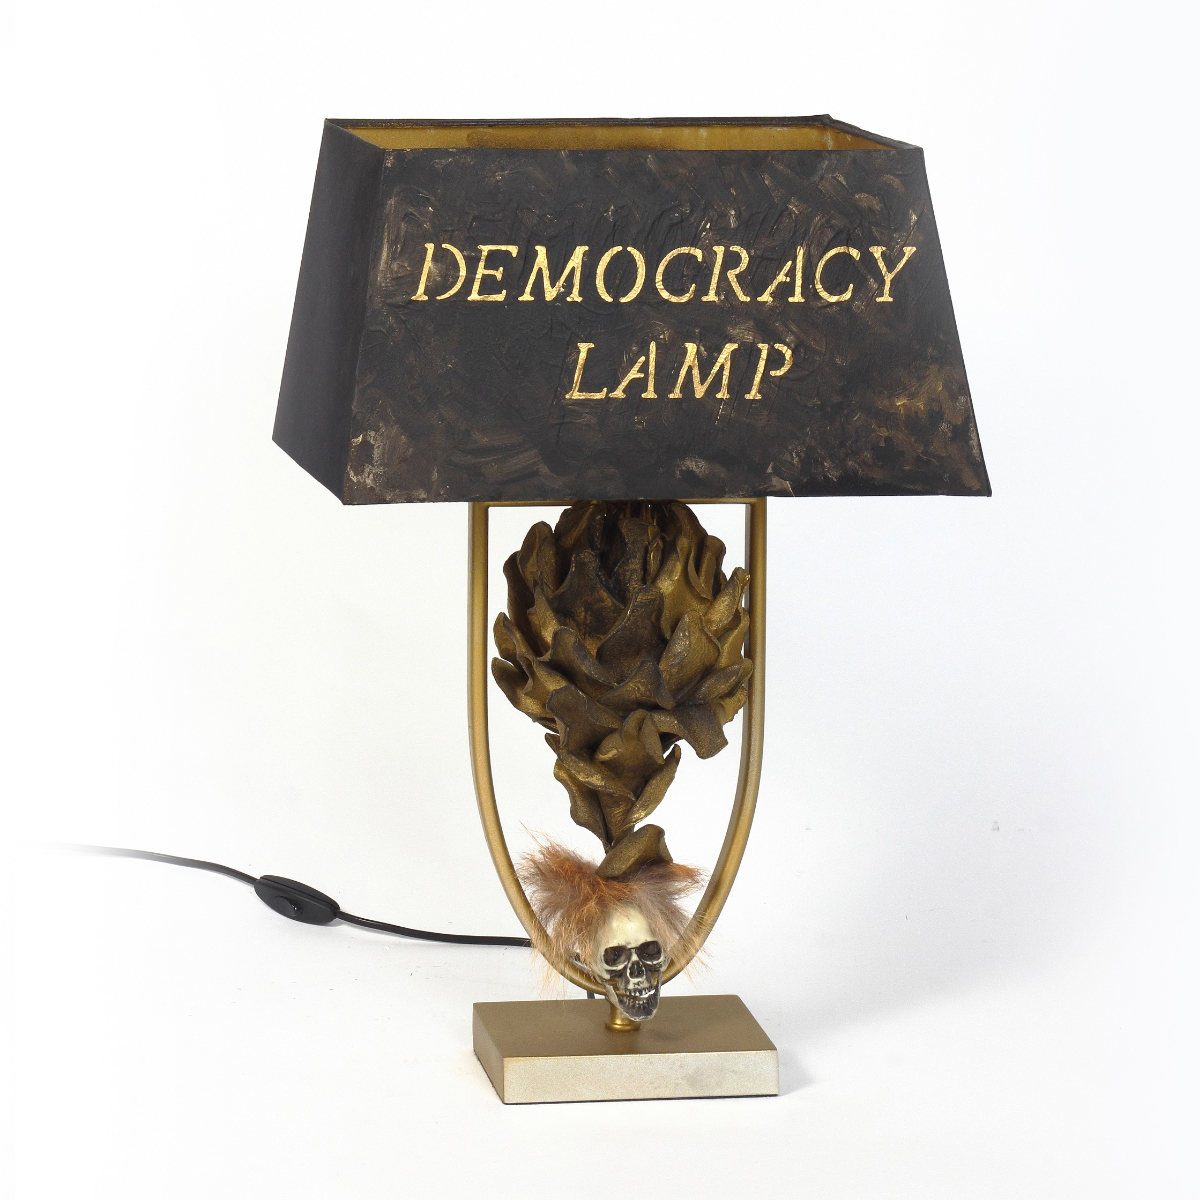 DEMOCRACY LAMP, 2017, sculpture